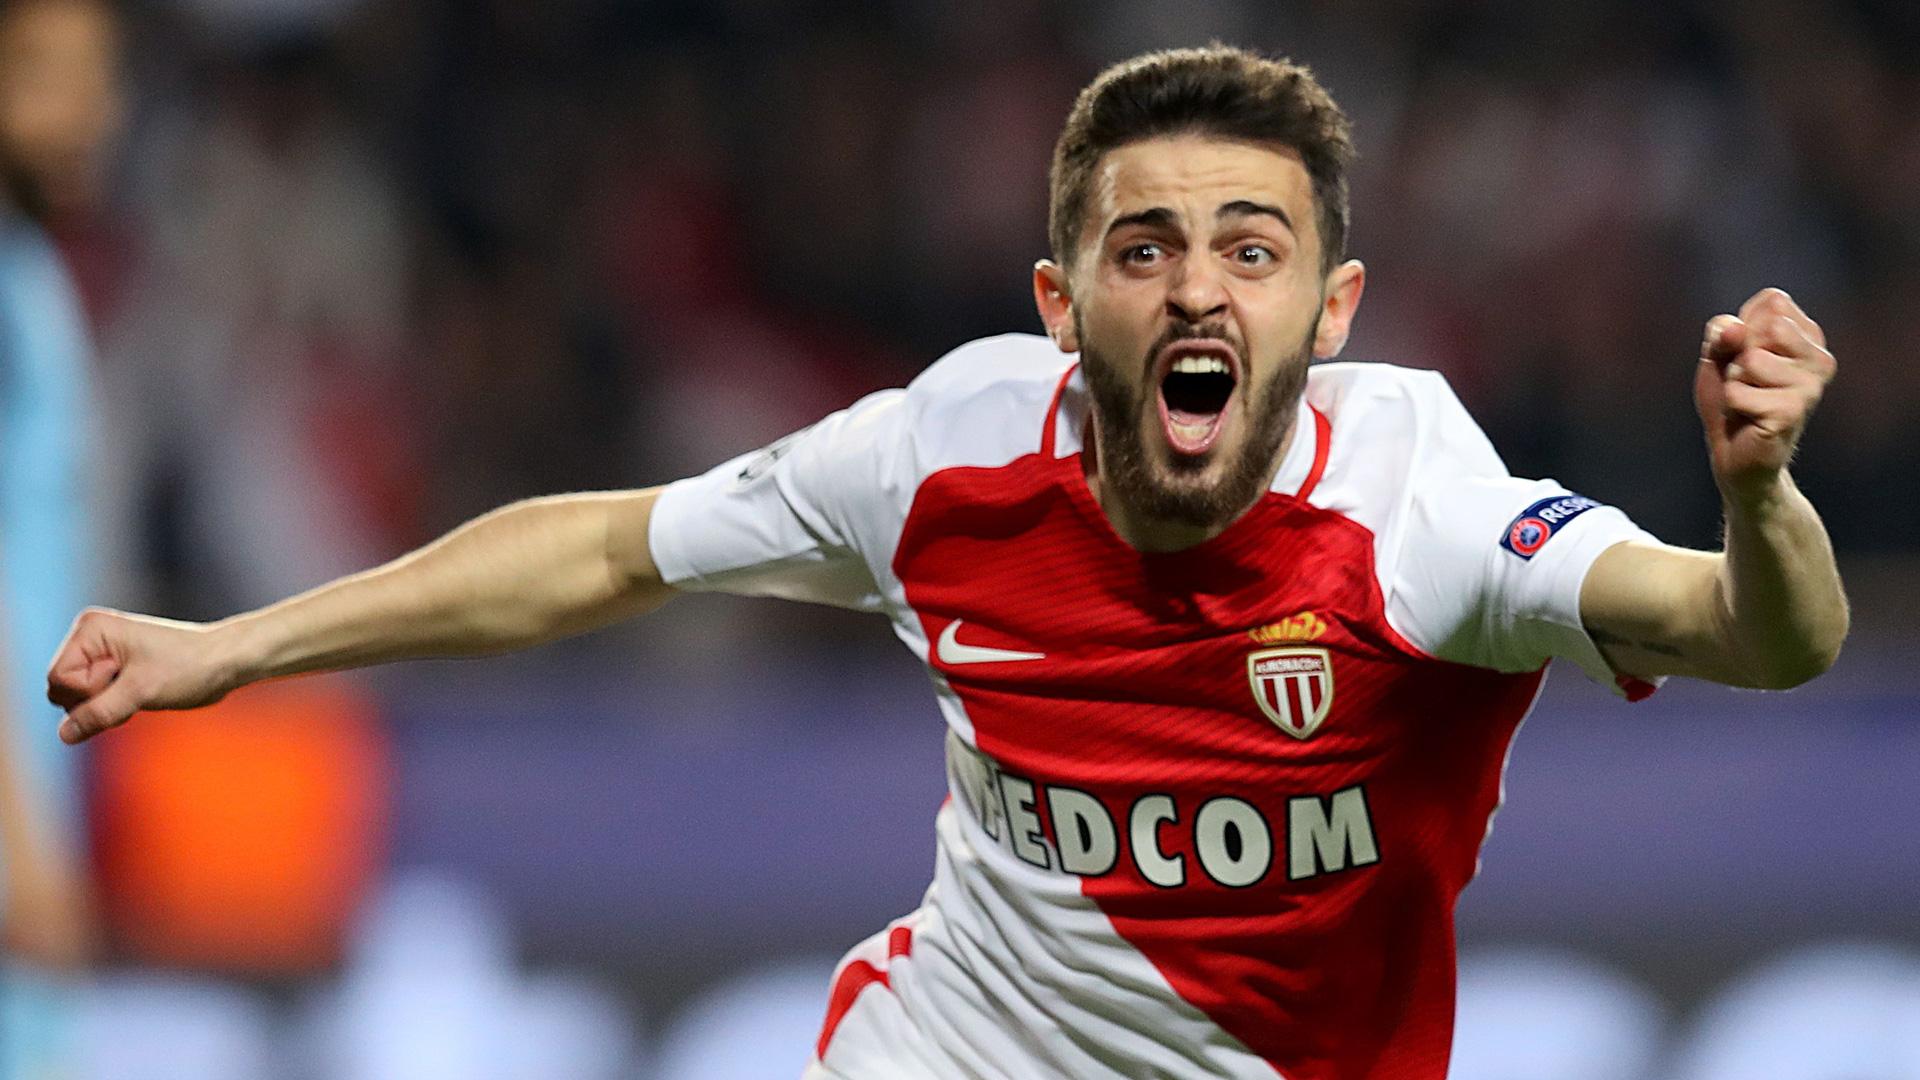 PSG - Mercato : Monaco, offre de 80 M€ annoncée pour Bernardo Silva